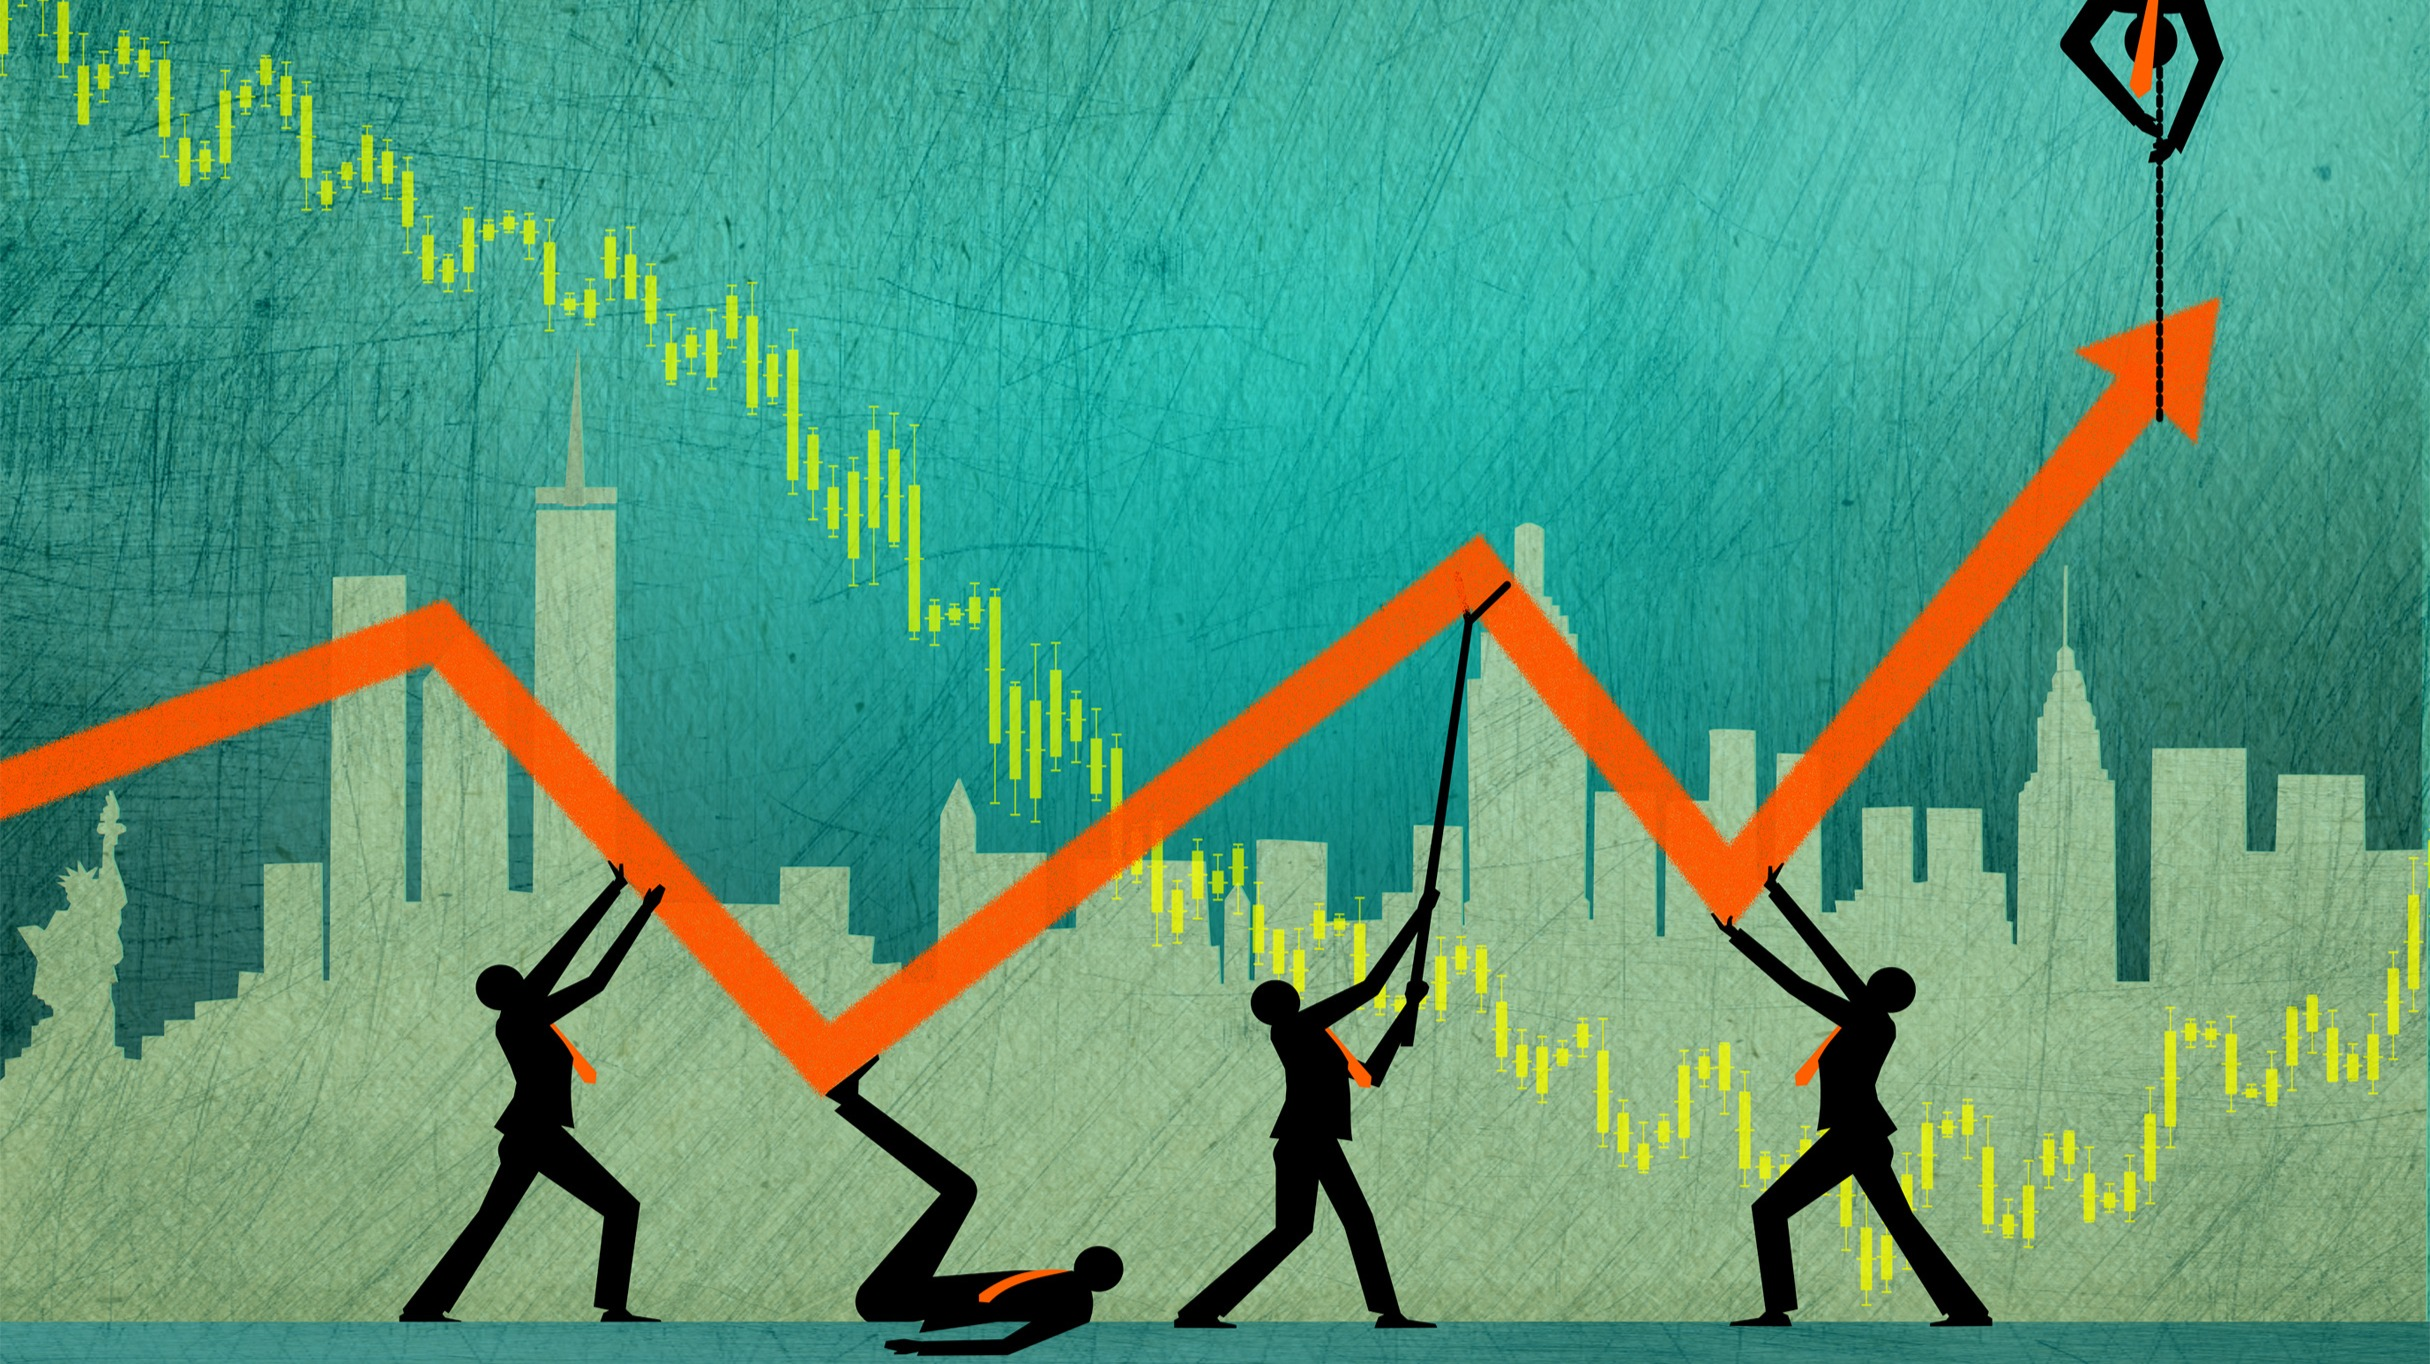 Top 5 Mistakes New Crypto Investors Make (AKA I Made)